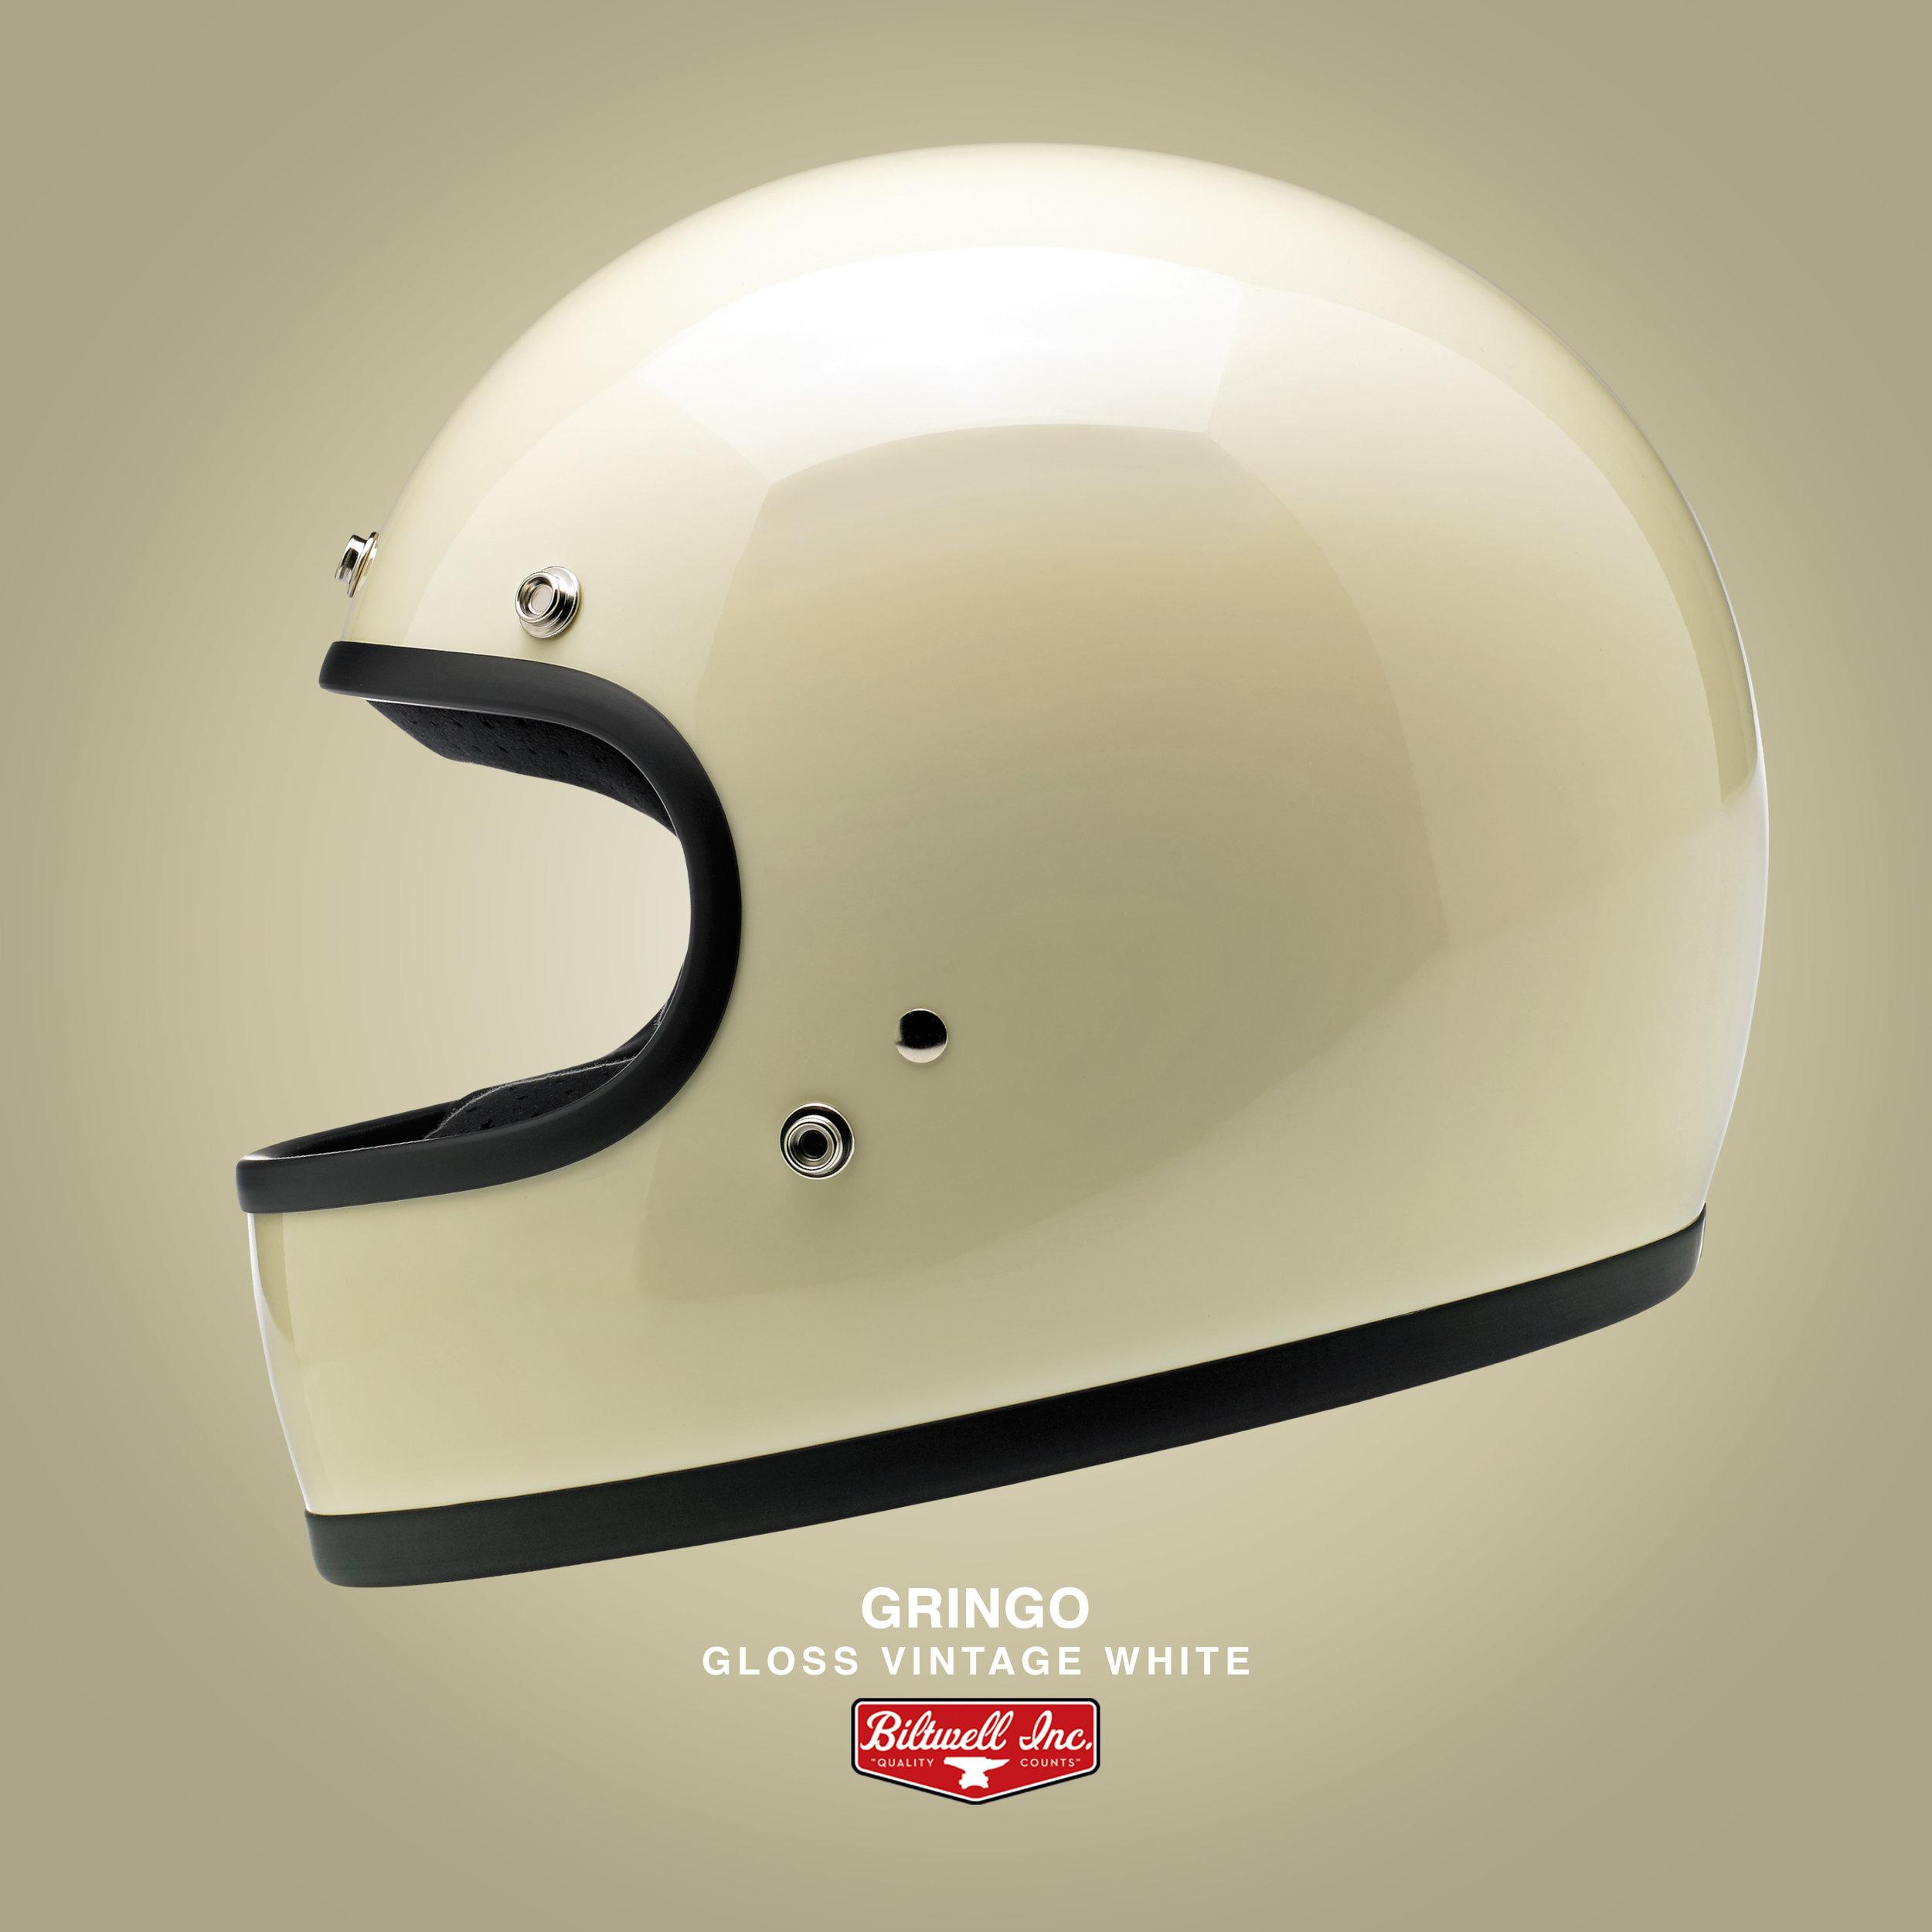 1002-102_Vintage White Gringo Helmet Panel.jpg